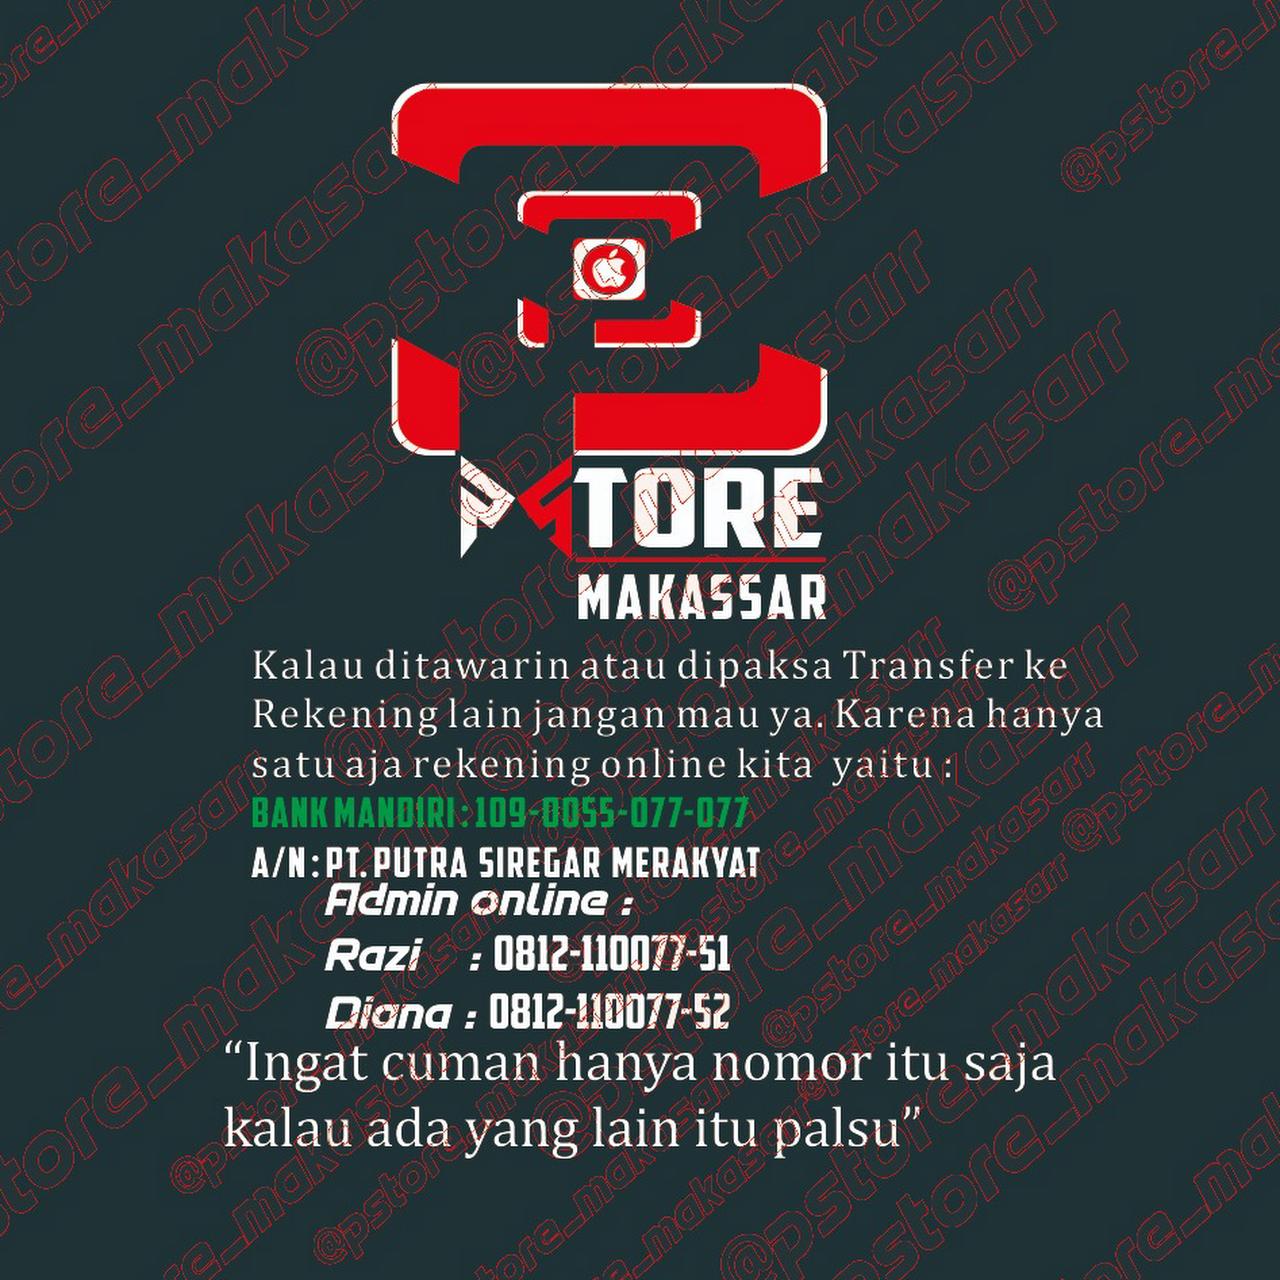 Pstore Makassar Toko Elektronik